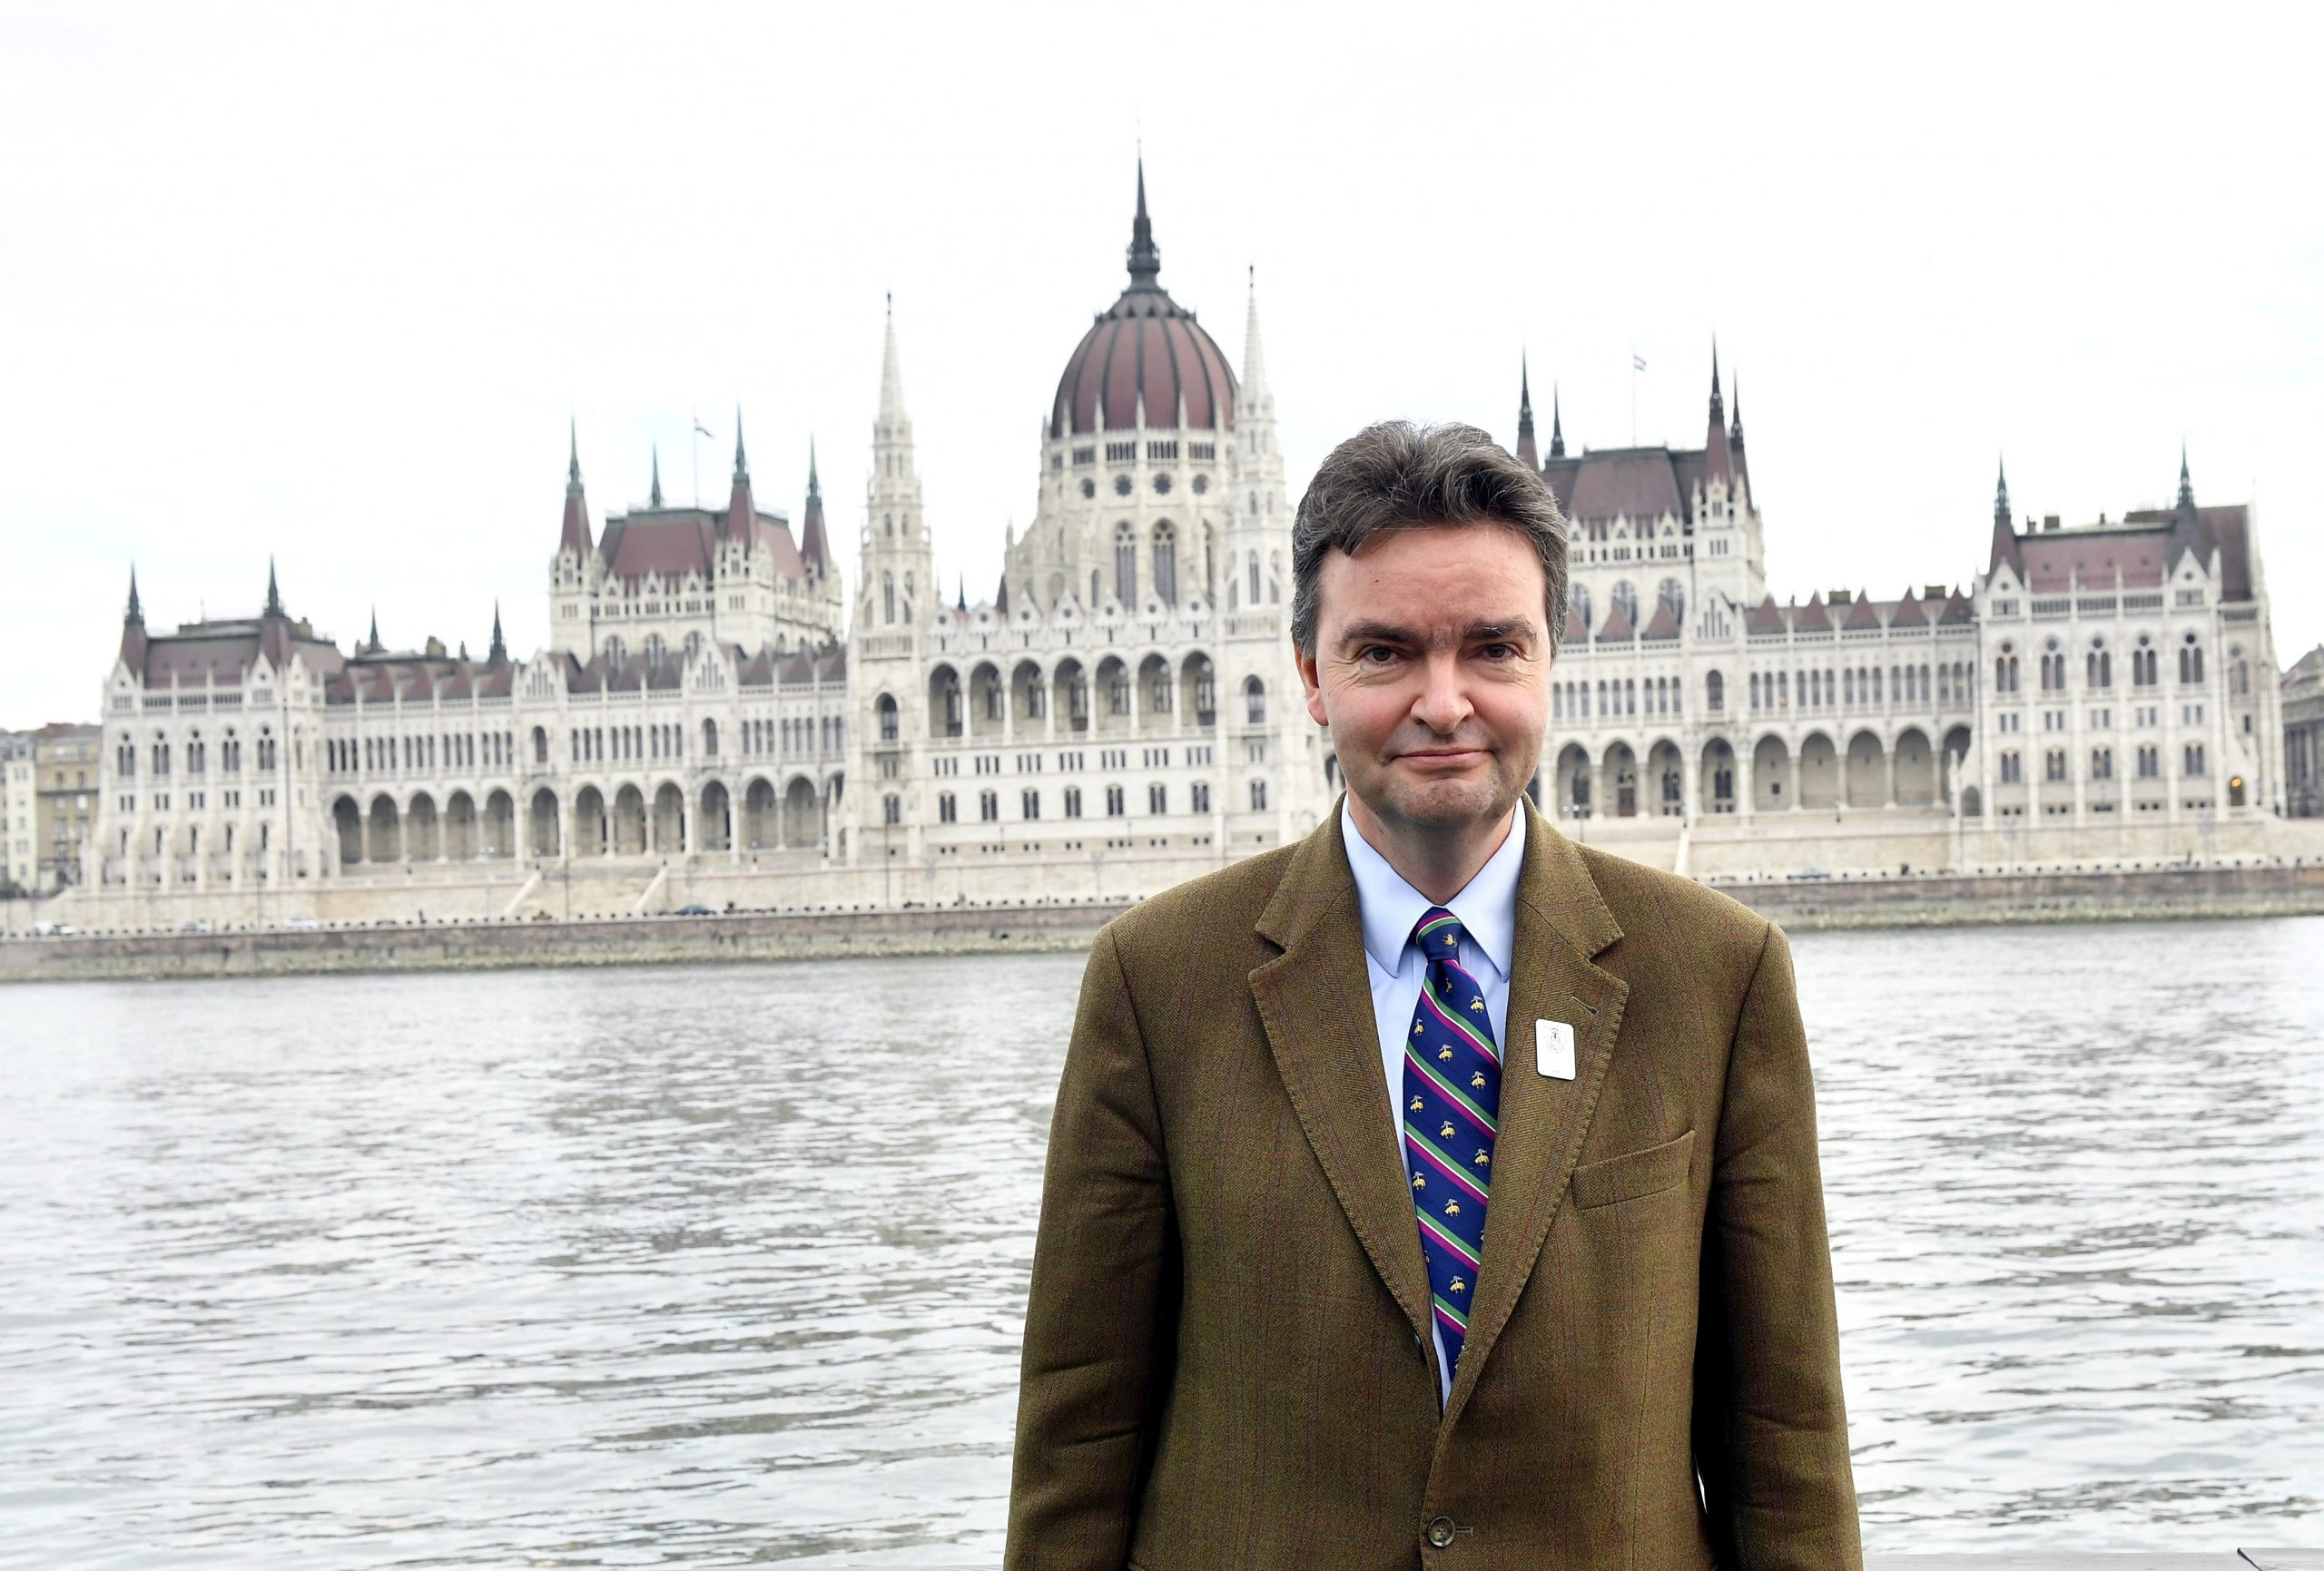 'Hungary is the center of my life' - György Habsburg, Hungary's New Ambassador to France